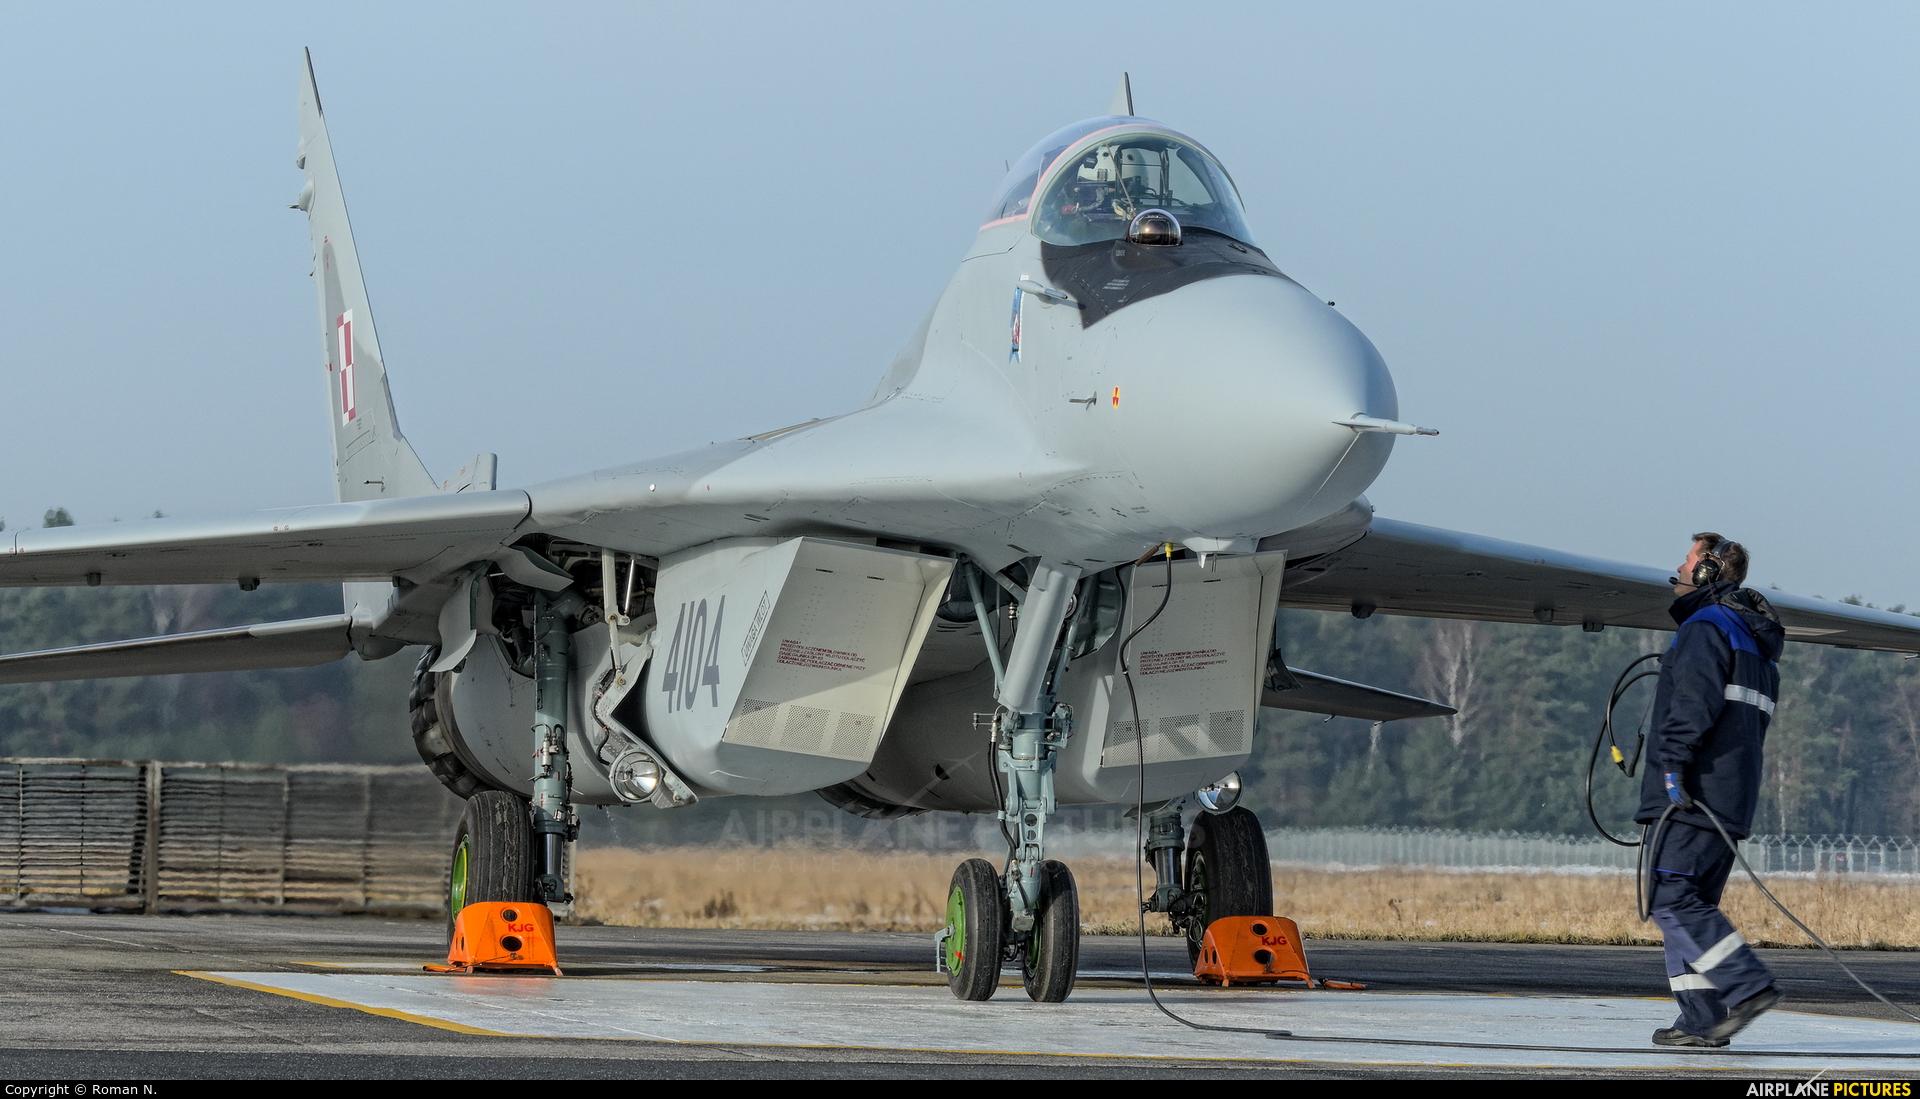 Poland - Air Force 4104 aircraft at Bydgoszcz - Szwederowo